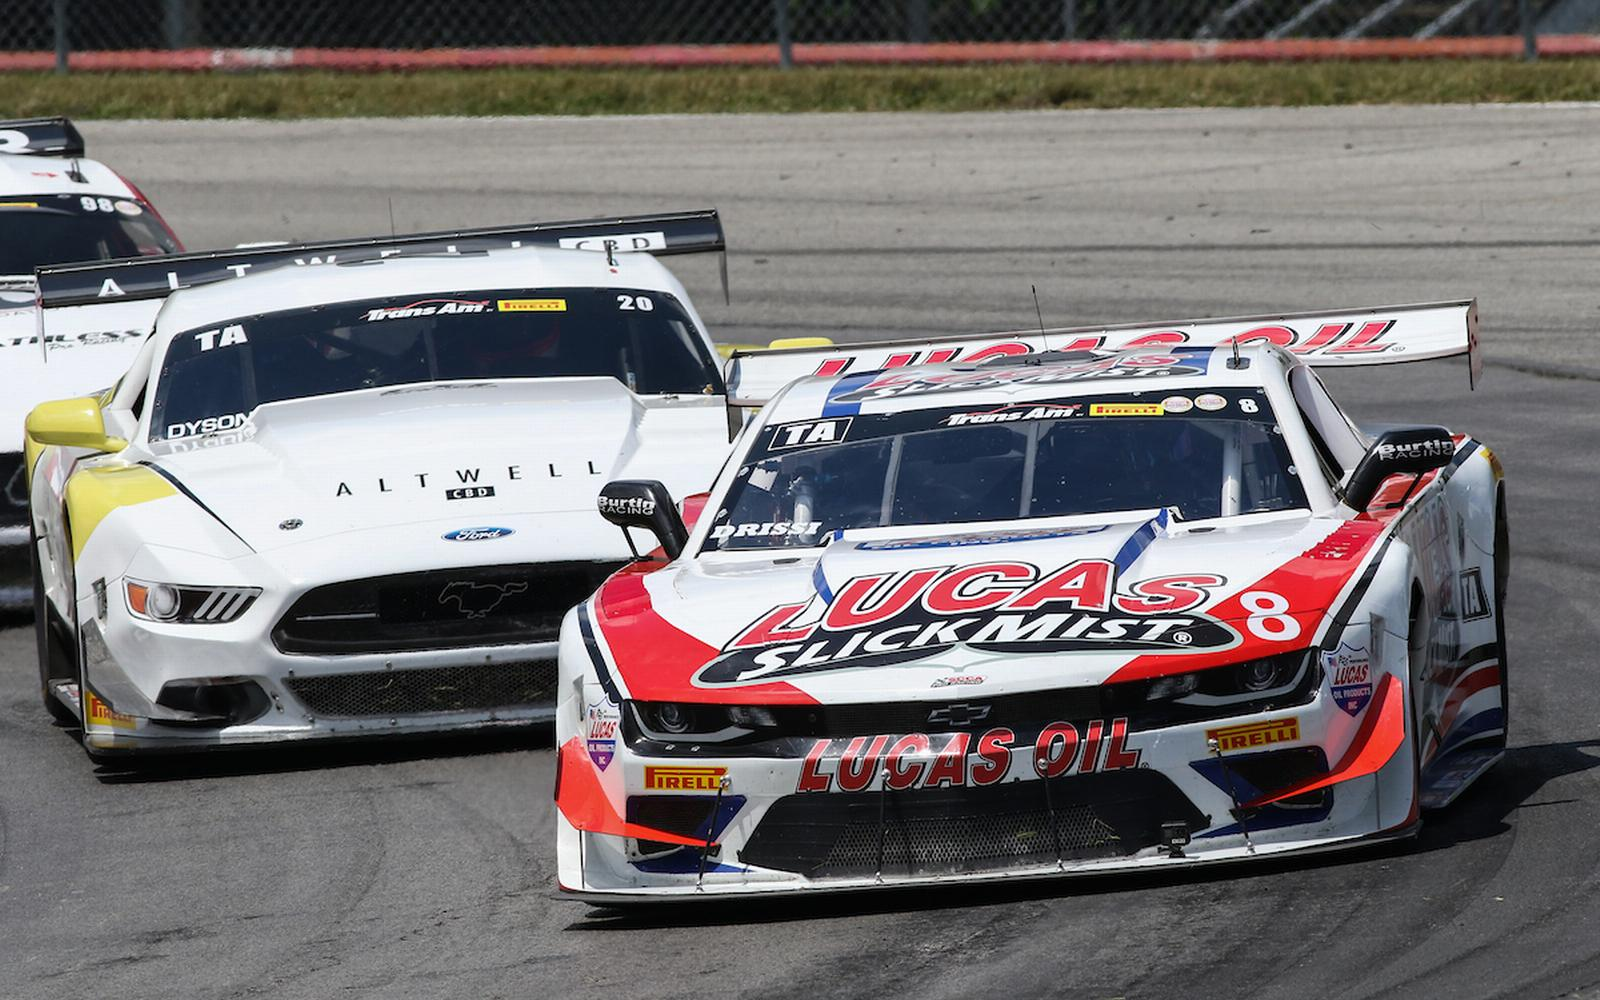 Lucas SlickMist Driver Tomy Drissi Celebrates Fourth Consecutive Podium at Mid-Ohio Sports Car Course